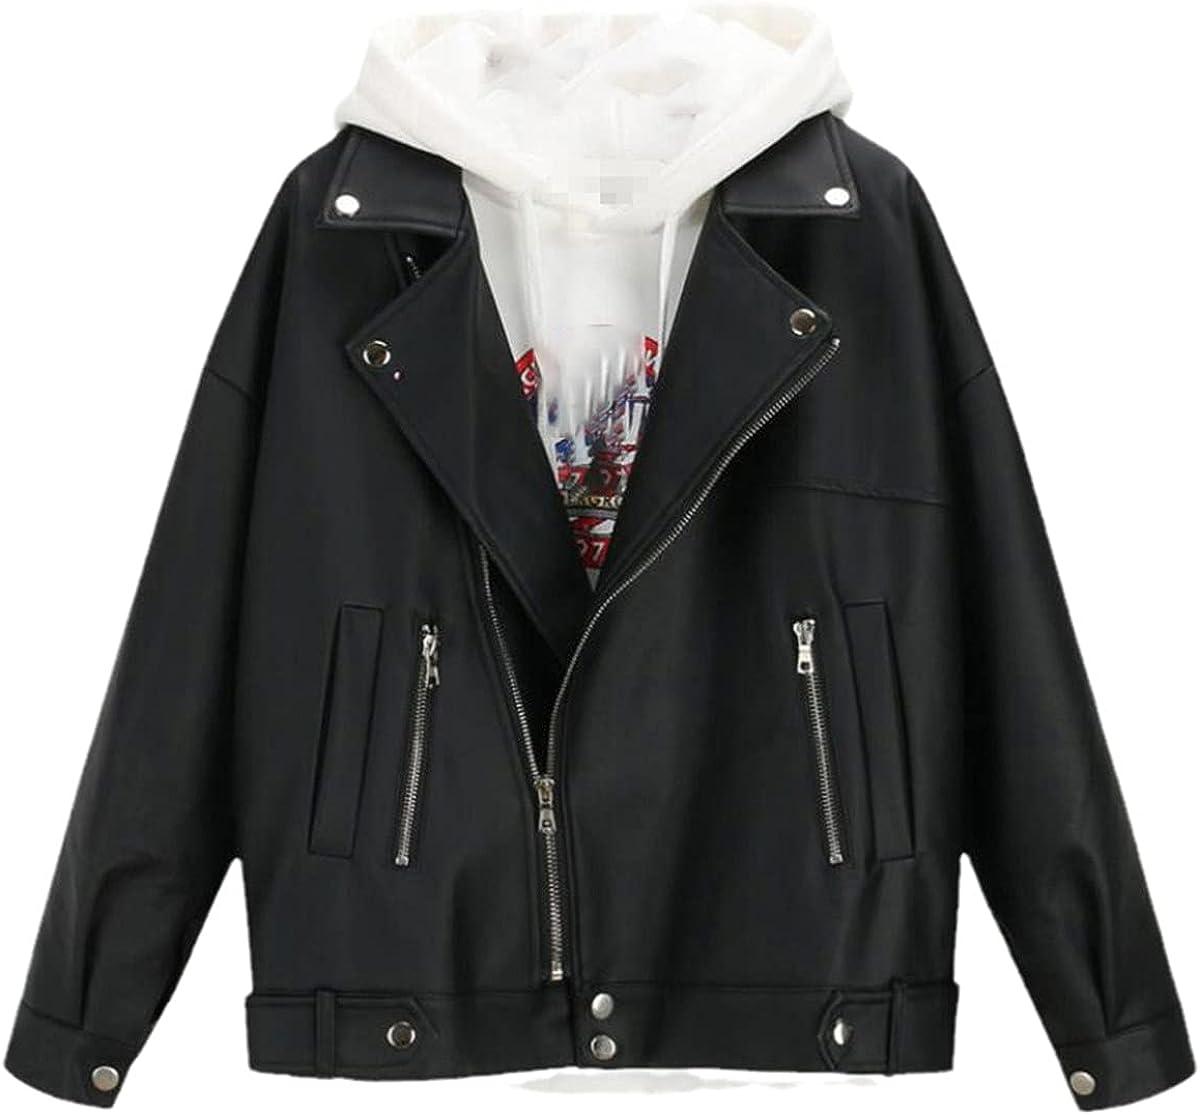 Women's autumn and winter leather jacket oversized boyfriend style Korean jacket black motorcycle jacket